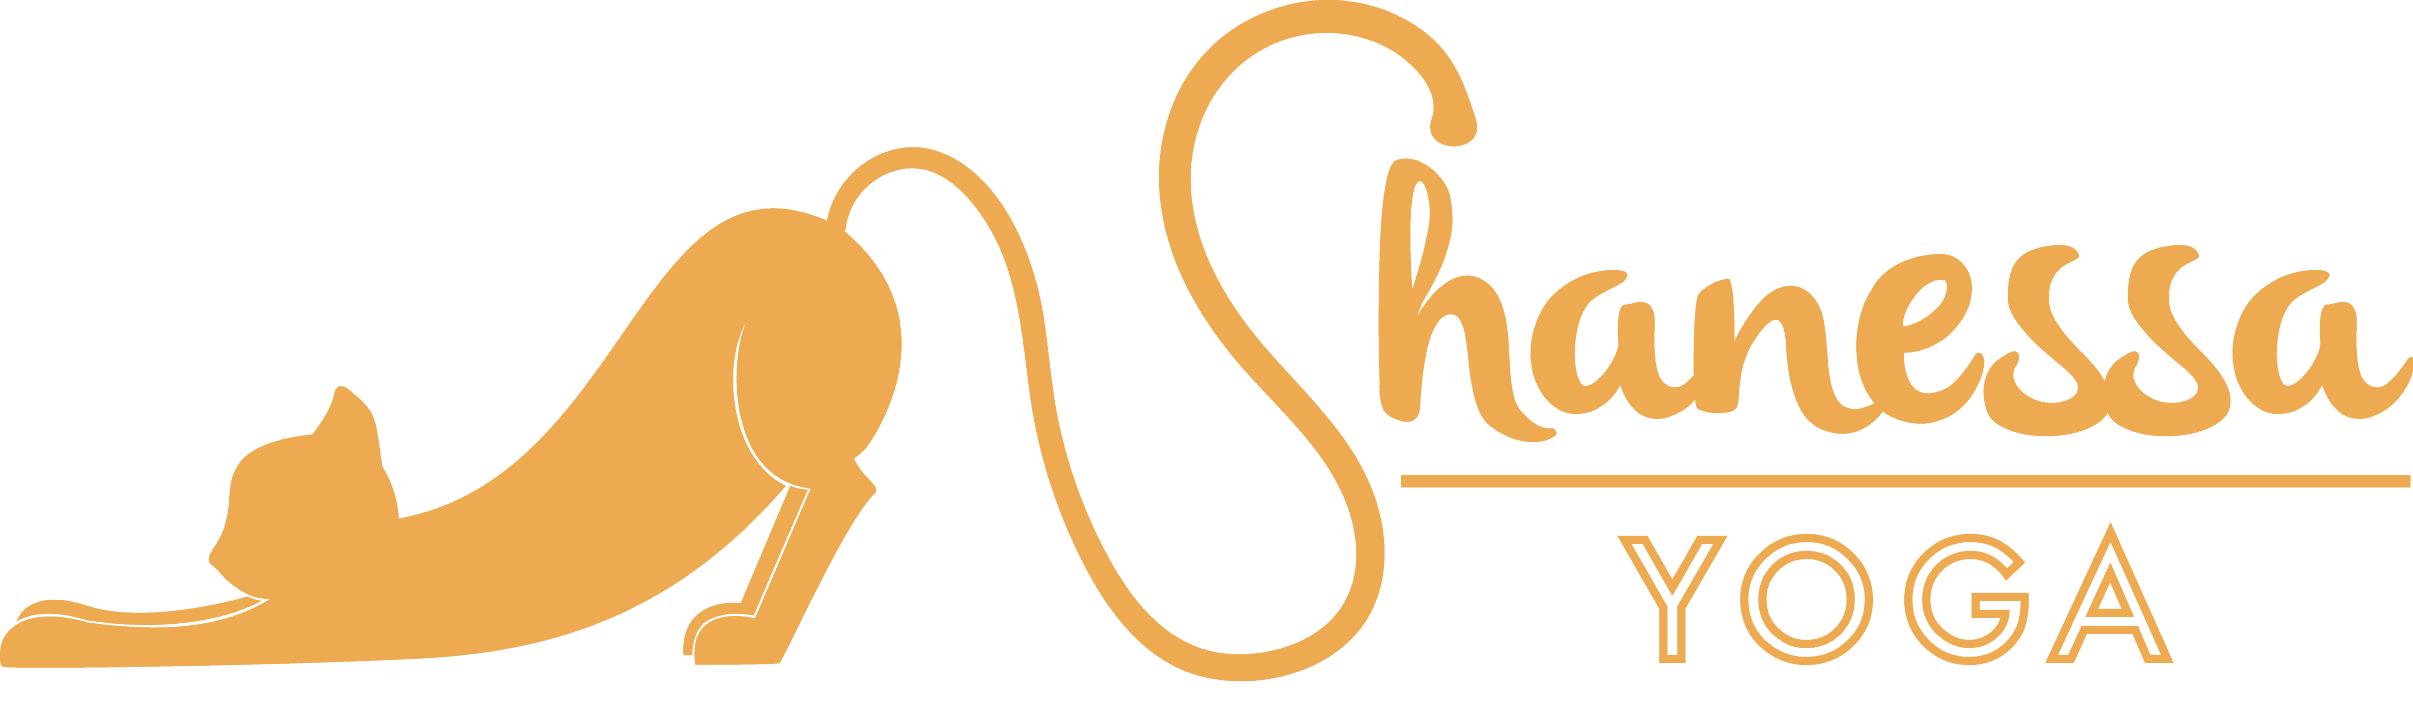 Yoga Shanessa